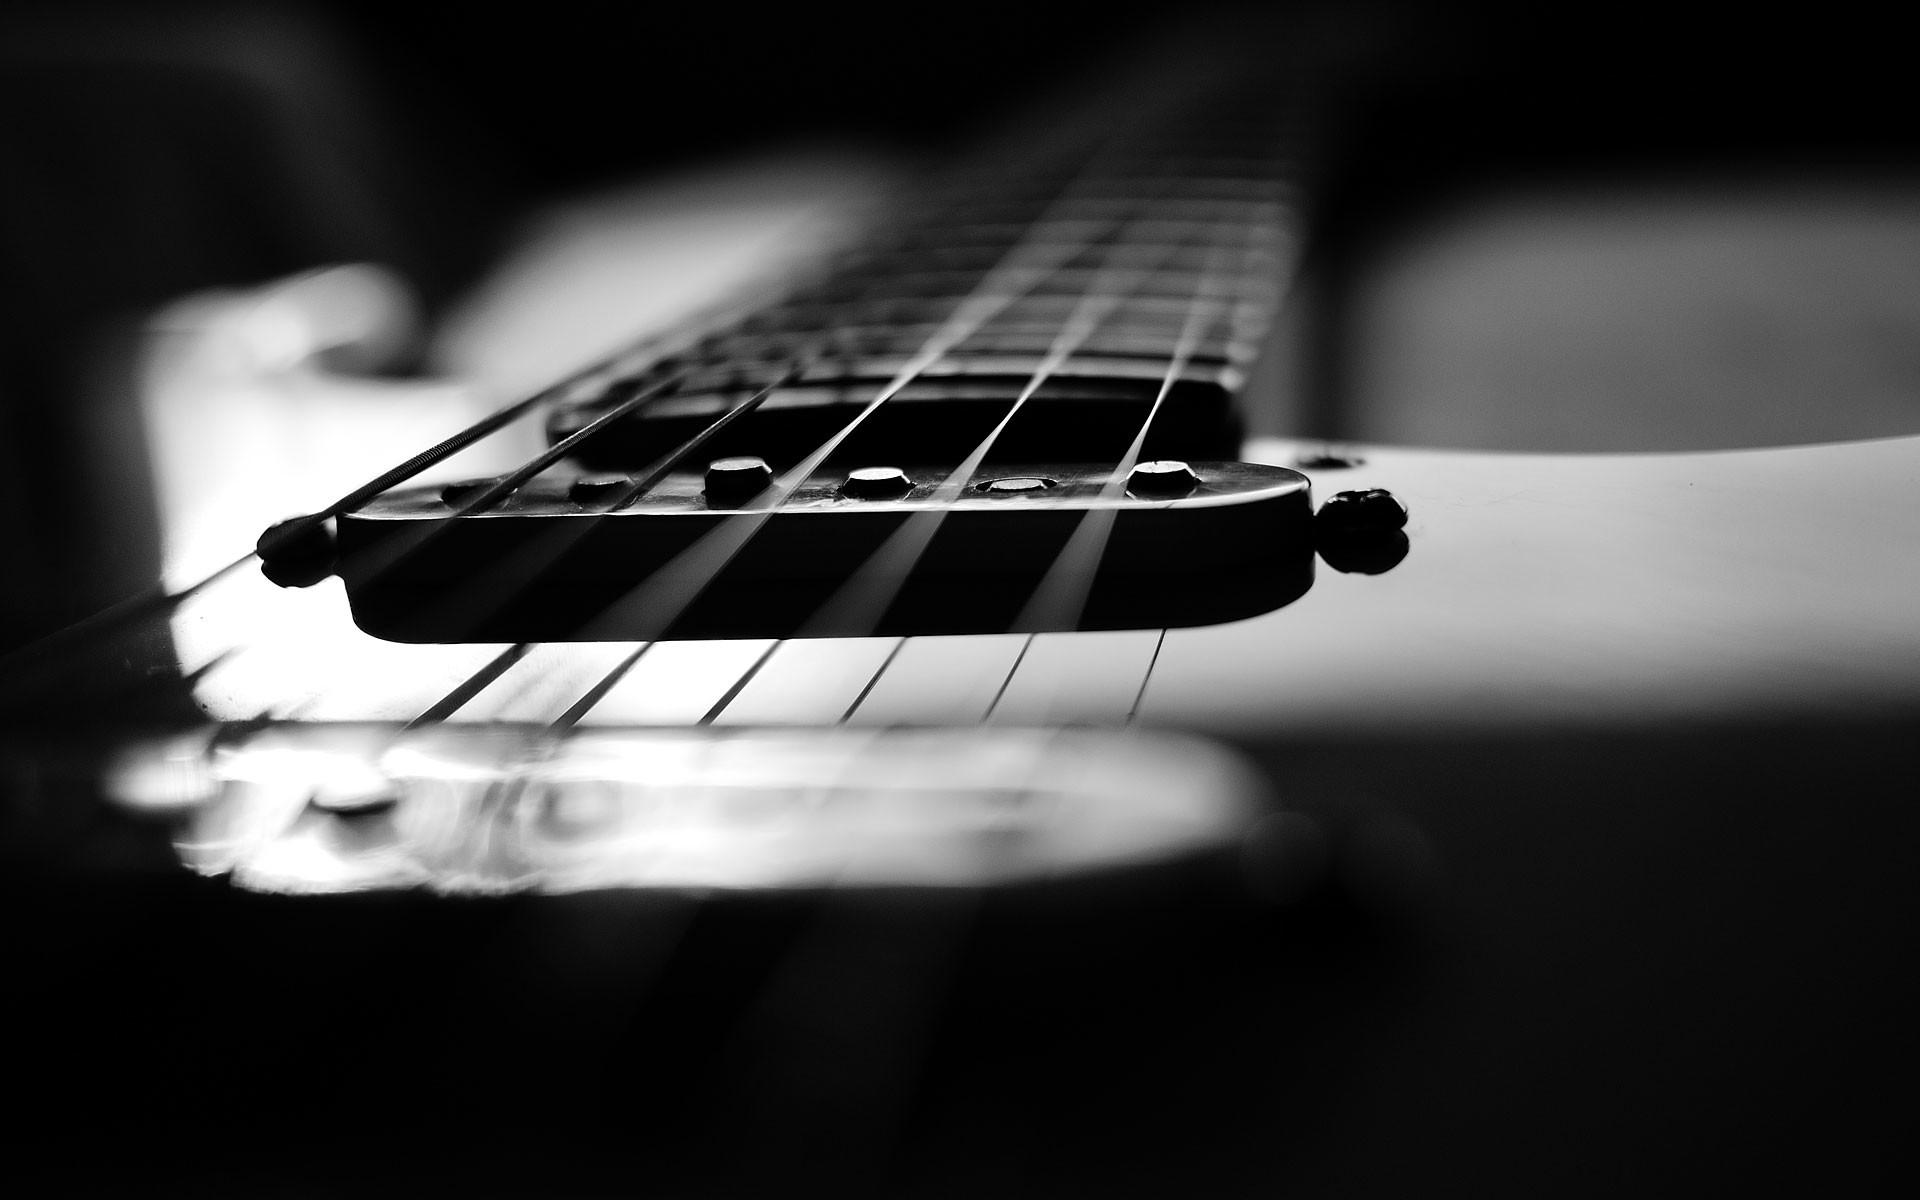 Bass Guitar Wallpapers (57+ Images